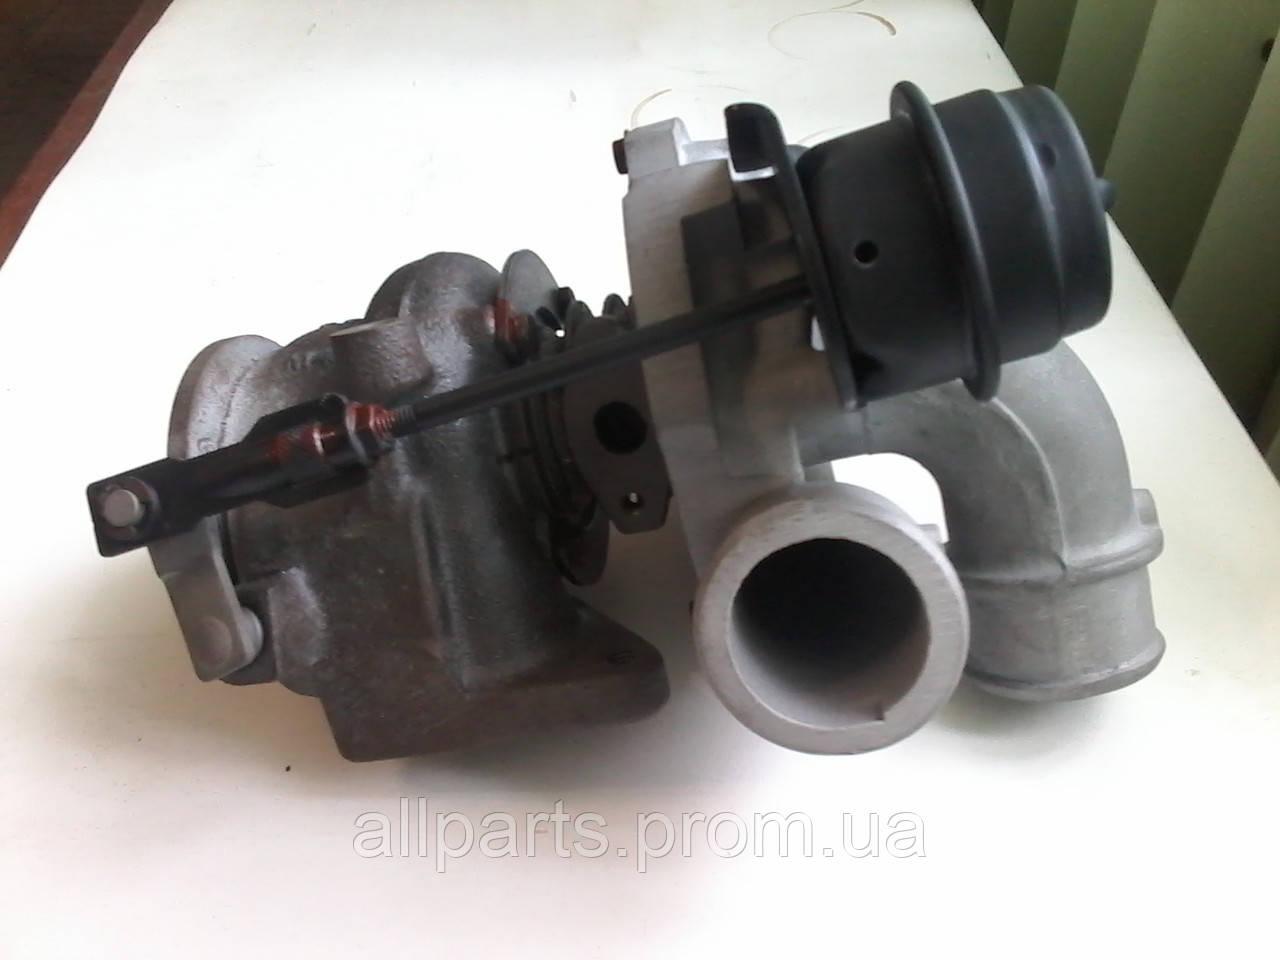 Турбина на Peugeot 306 Hdi 2.0 - BorgWarner / KKK 53039880023